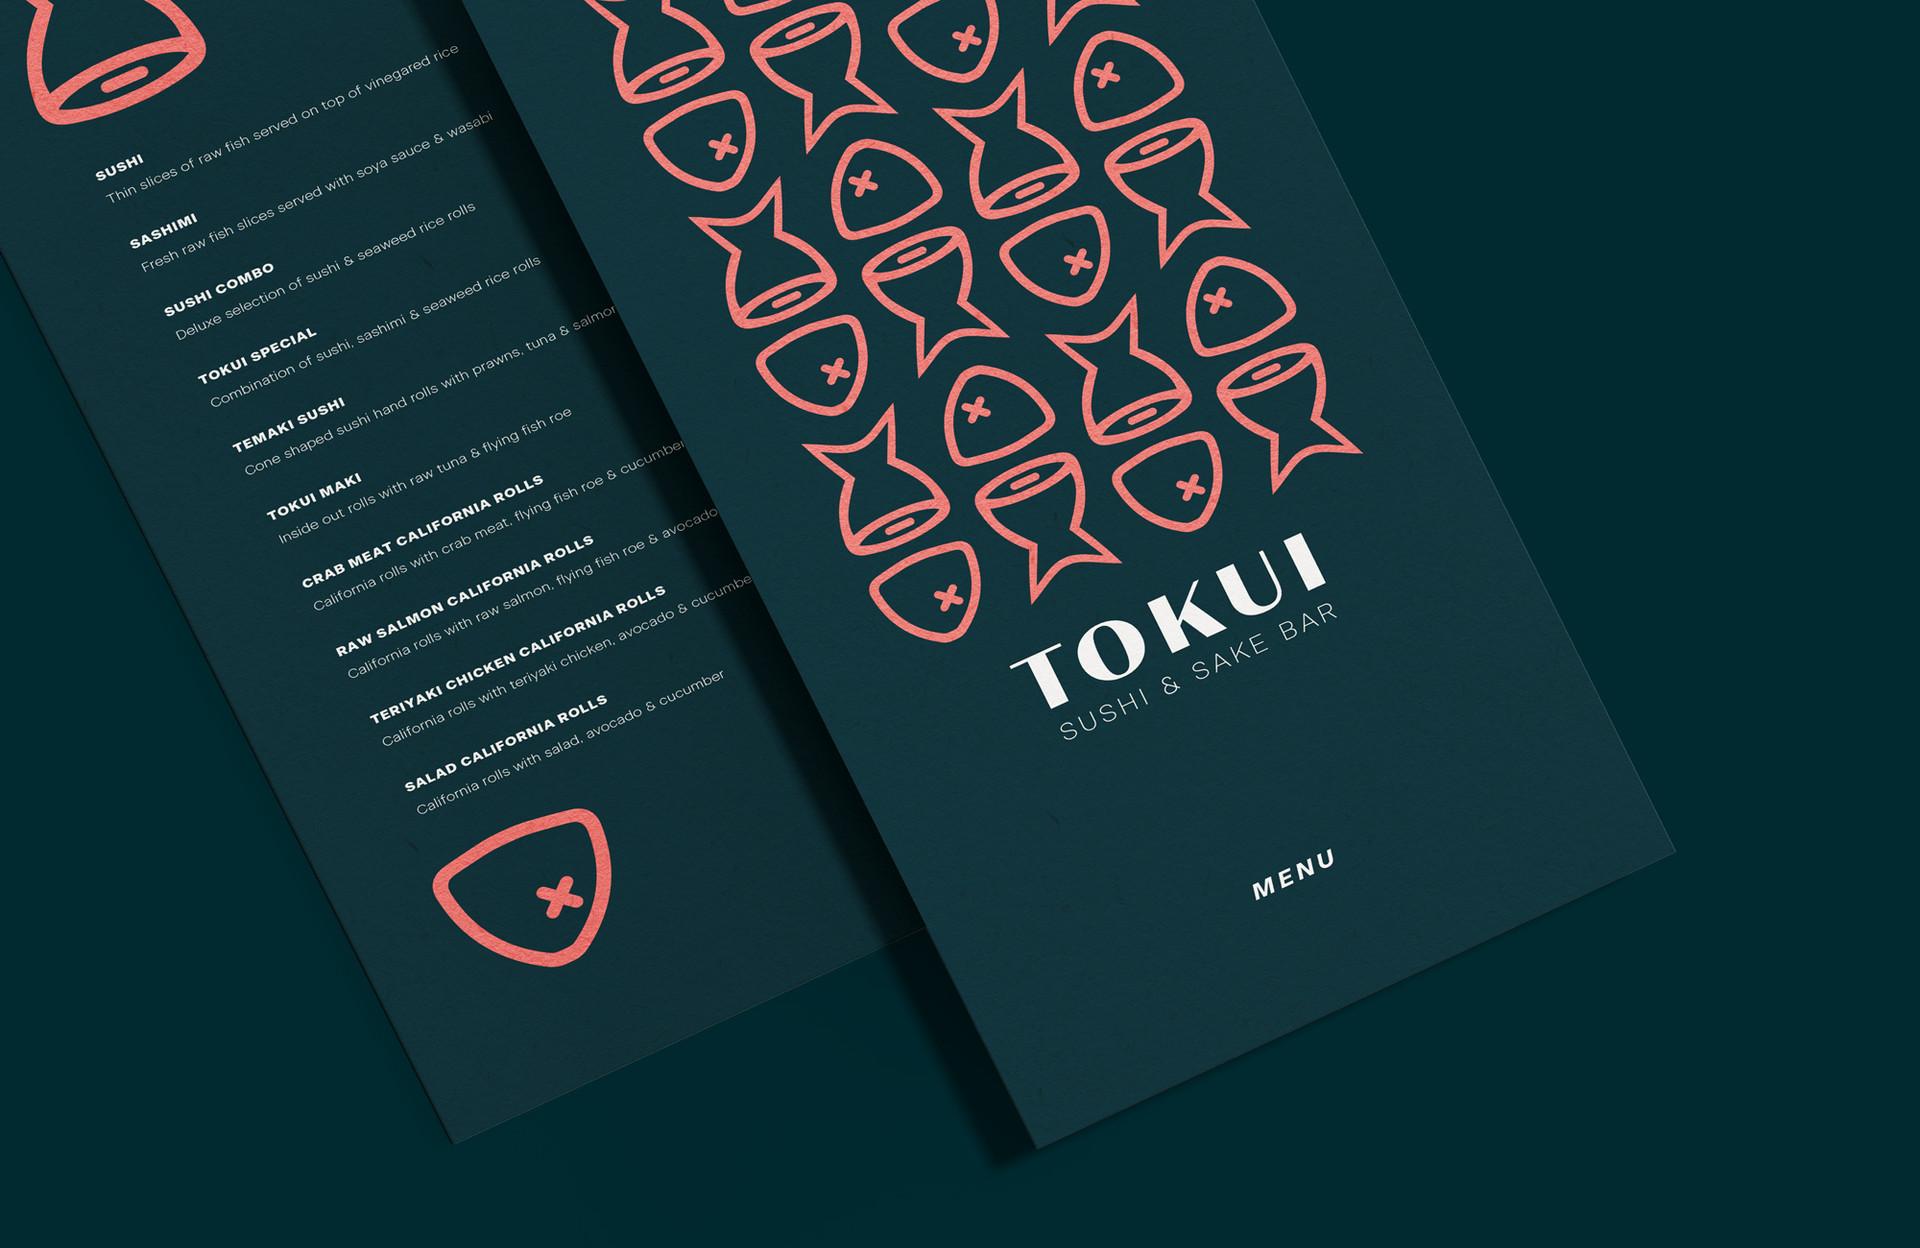 menu_mockup.jpg